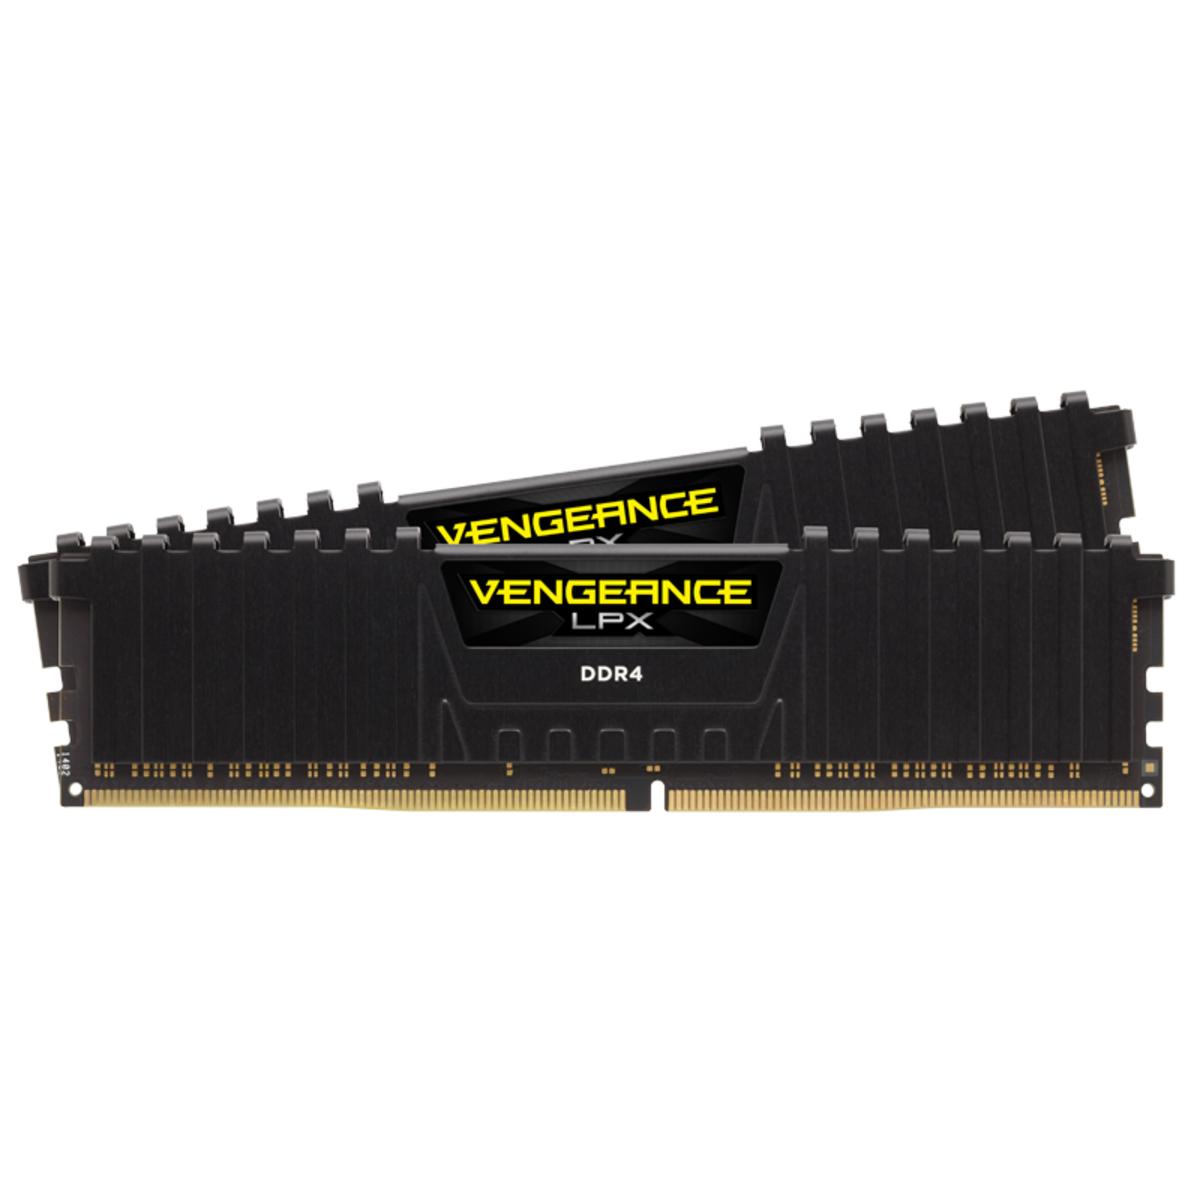 Corsair Vengeance LPX Black 16GB DDR4 (2x8GB) 3600MHz (PC4-28800) CL18